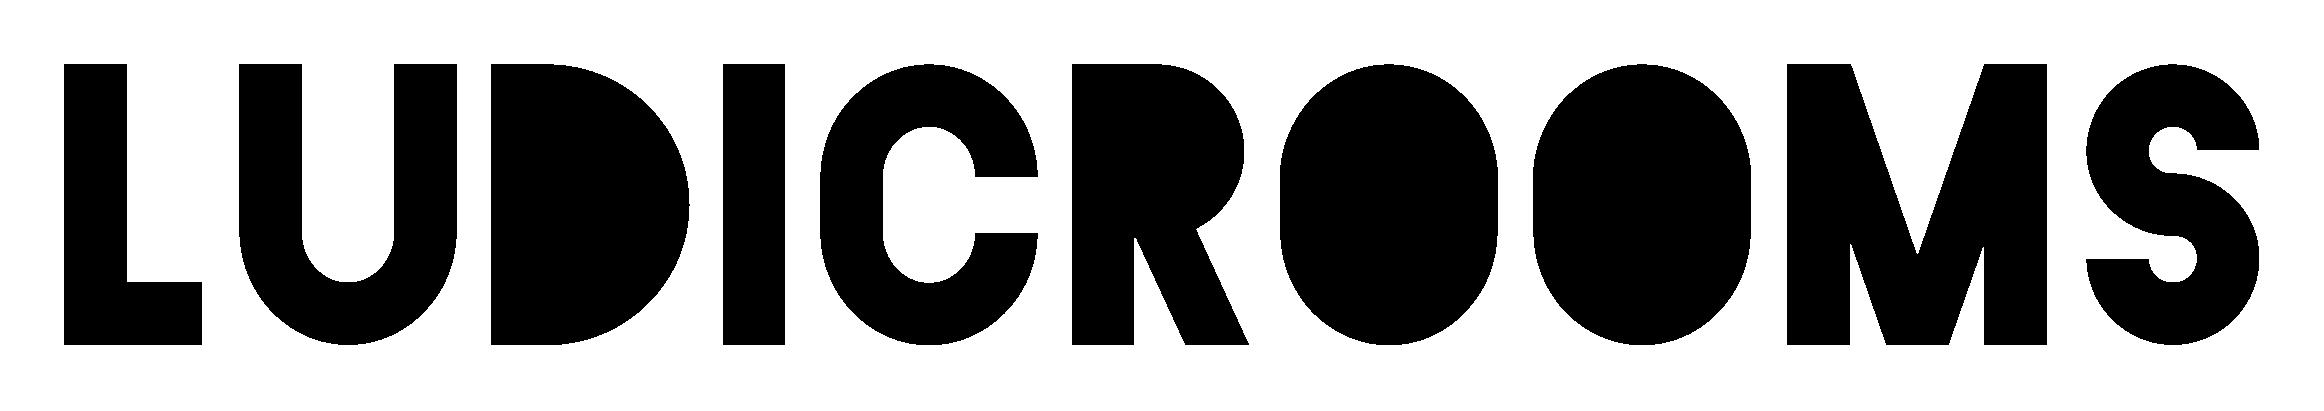 Ludic Rooms logo.